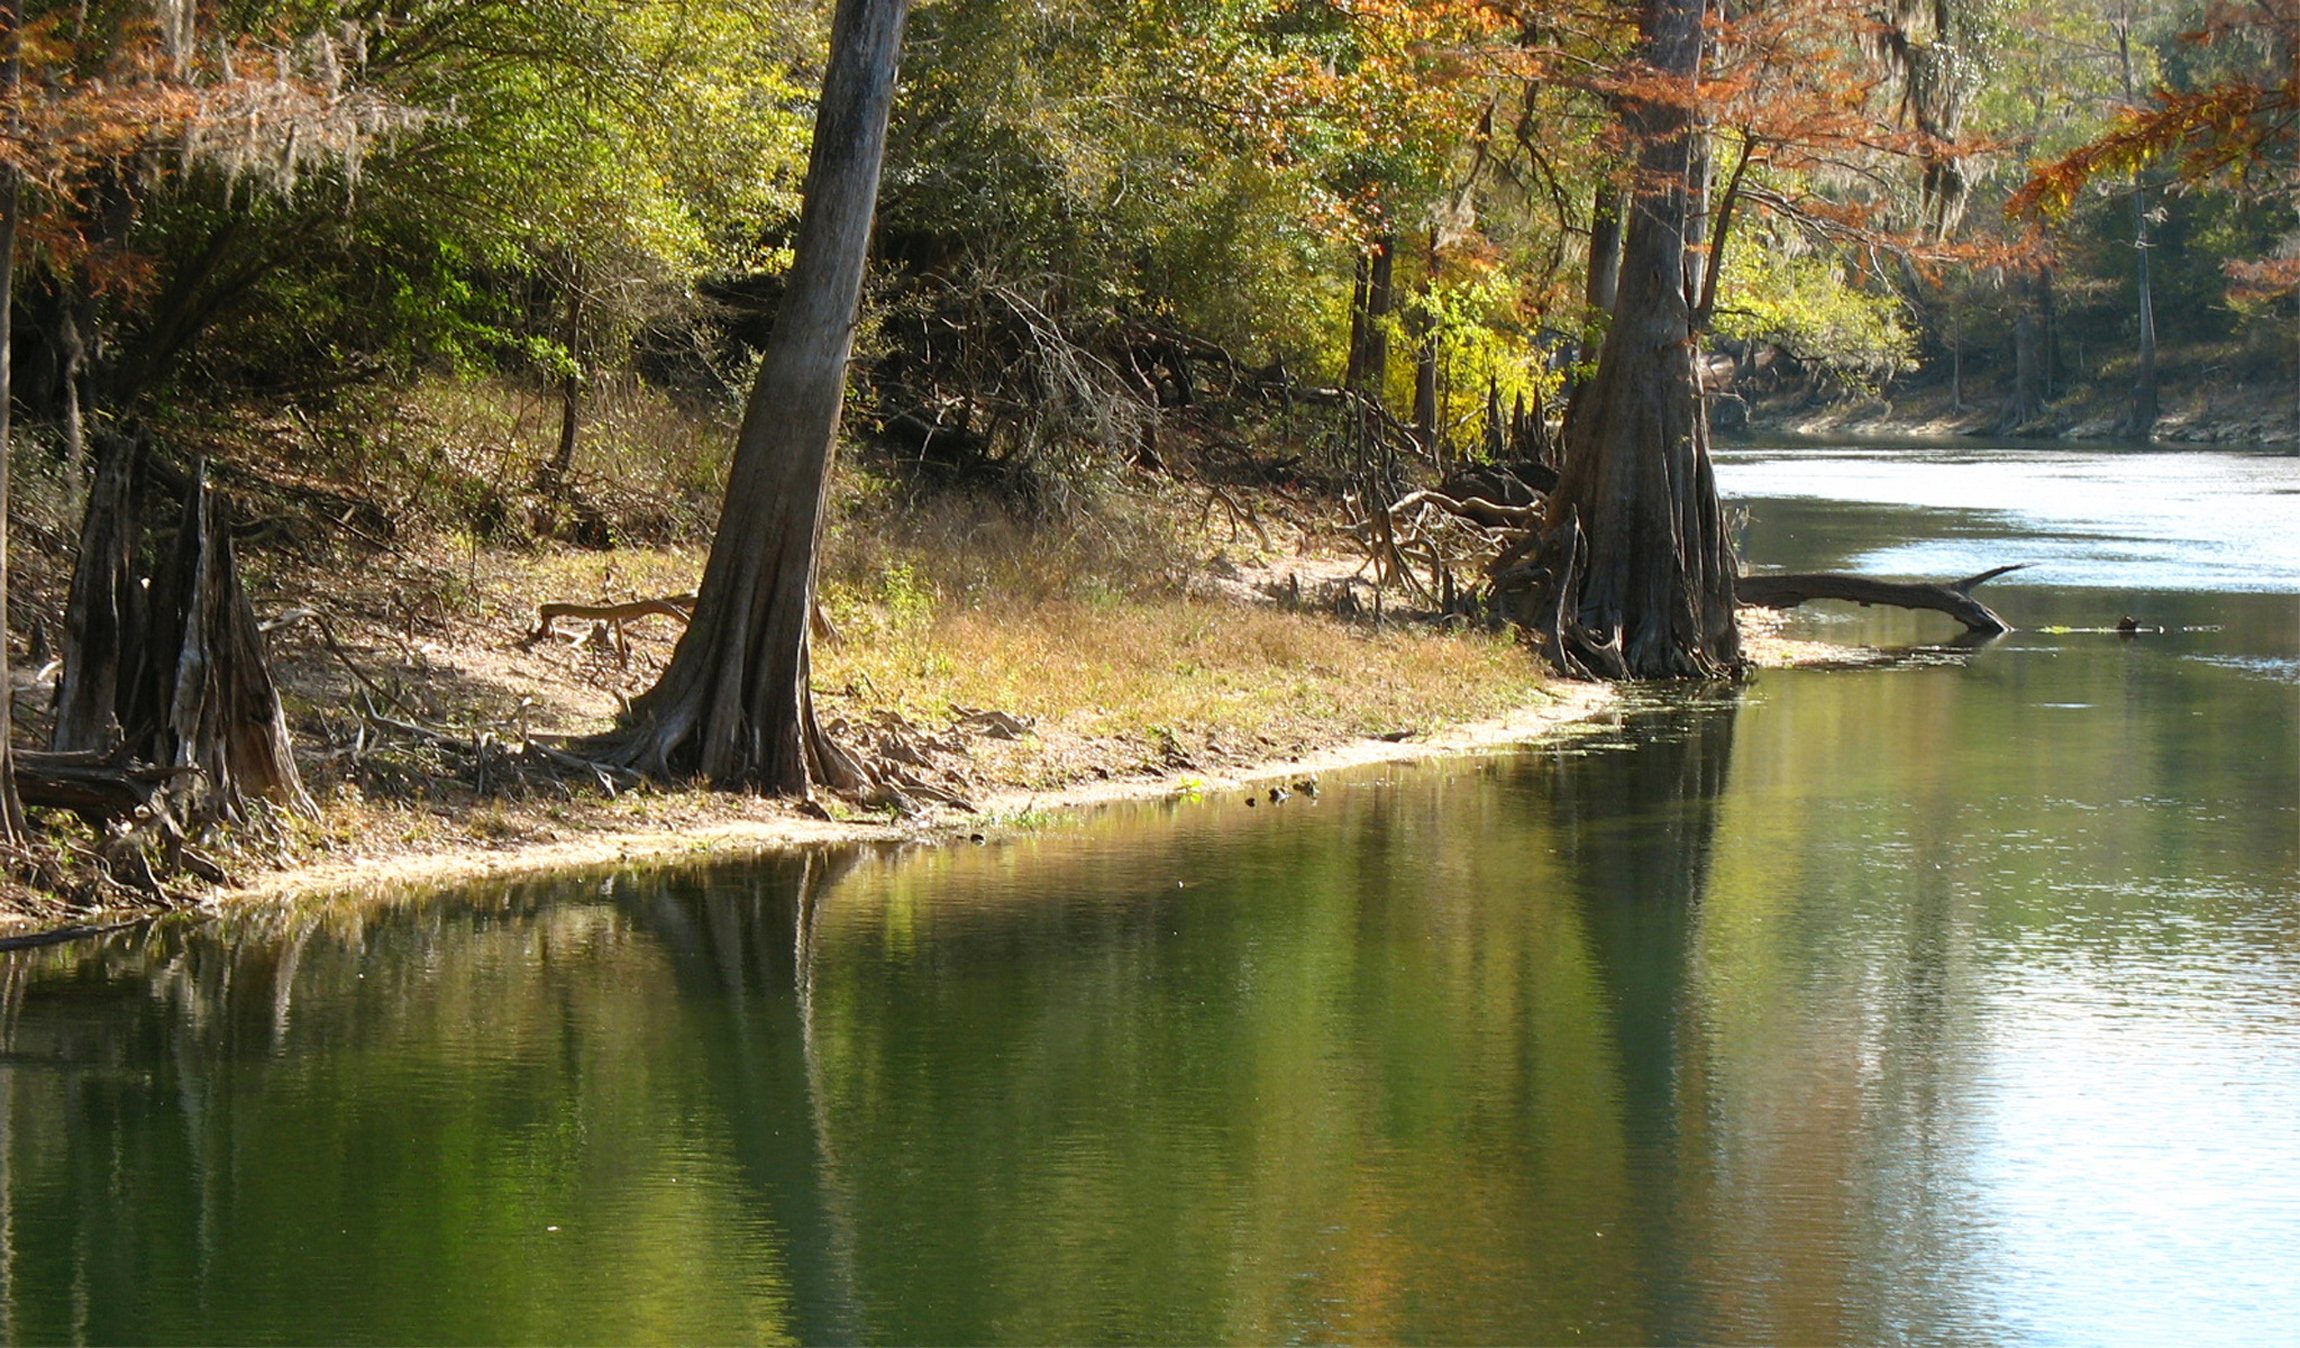 River Going Down To Gulf, Beautiful, Bspo06, Florida, Green, HQ Photo